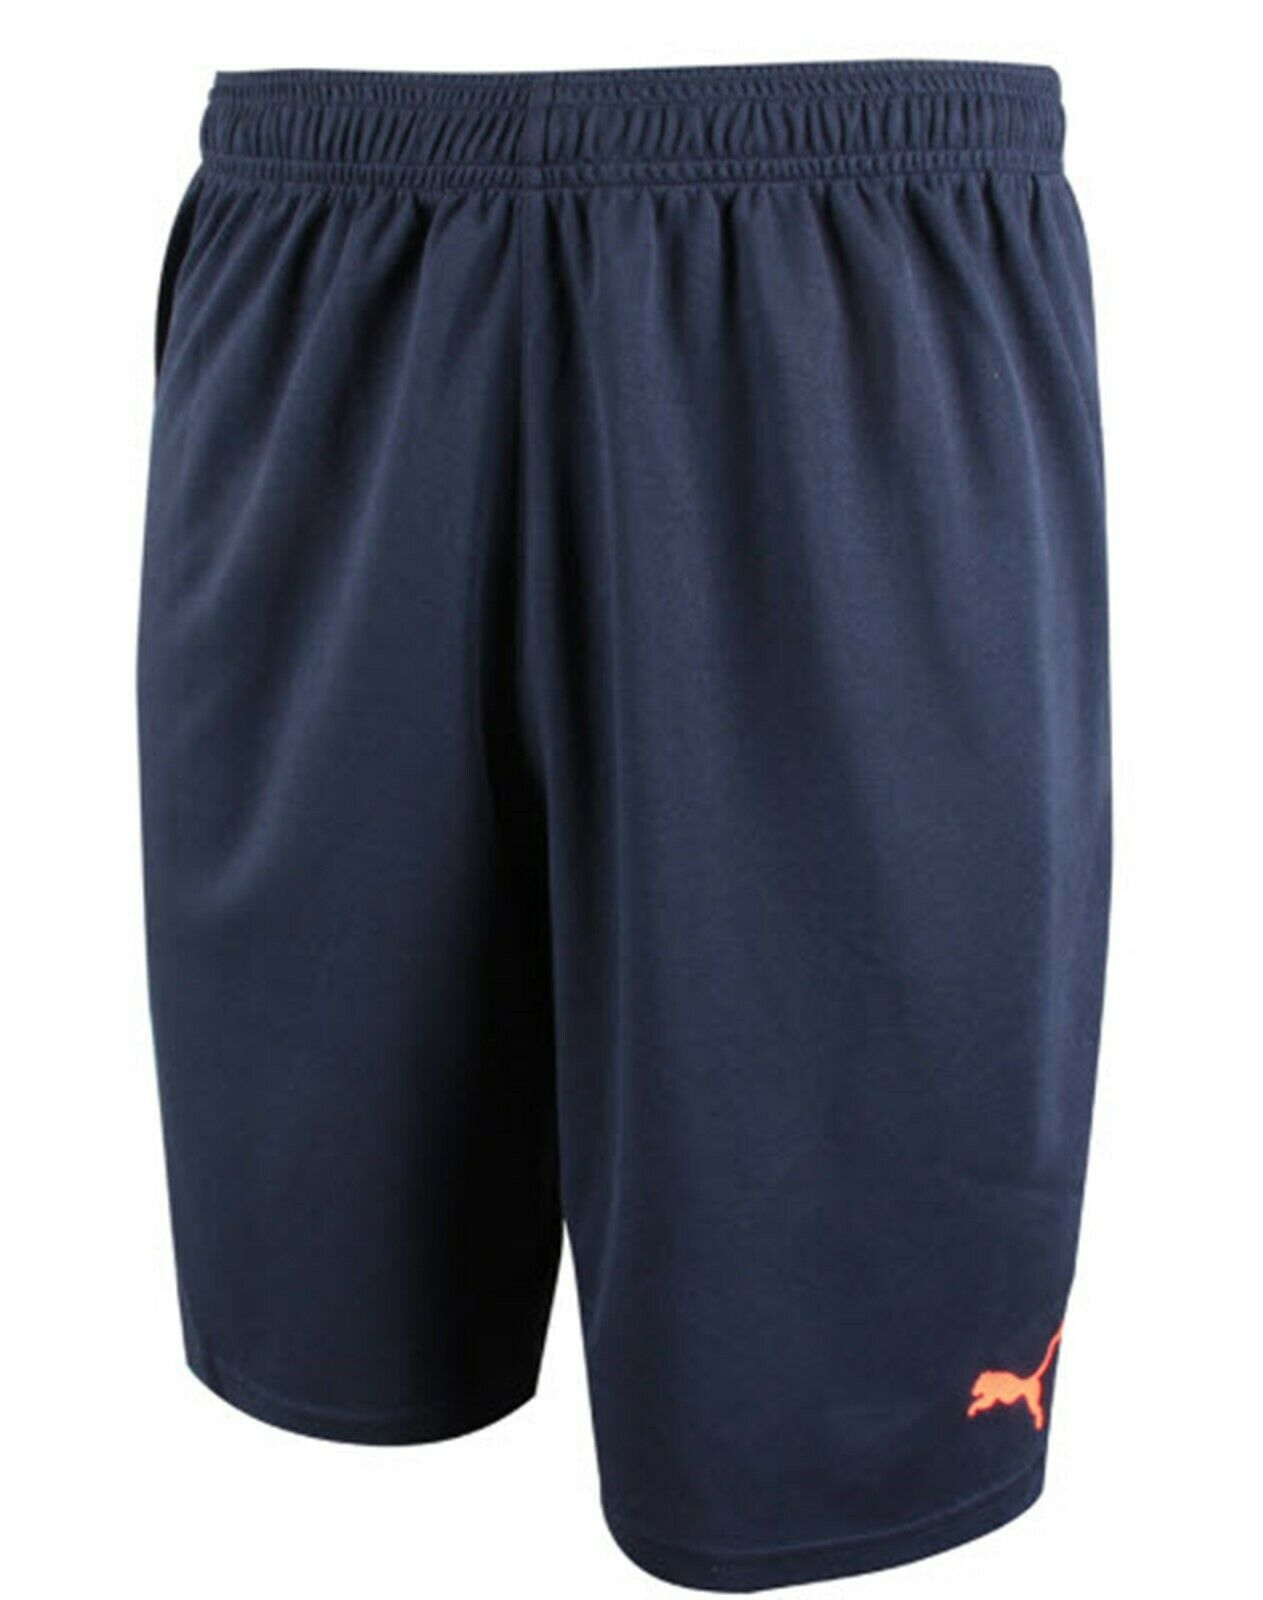 Puma Men BTS Shorts Pants Training Navy Running Soccer Uniform GYM Pant 65459745